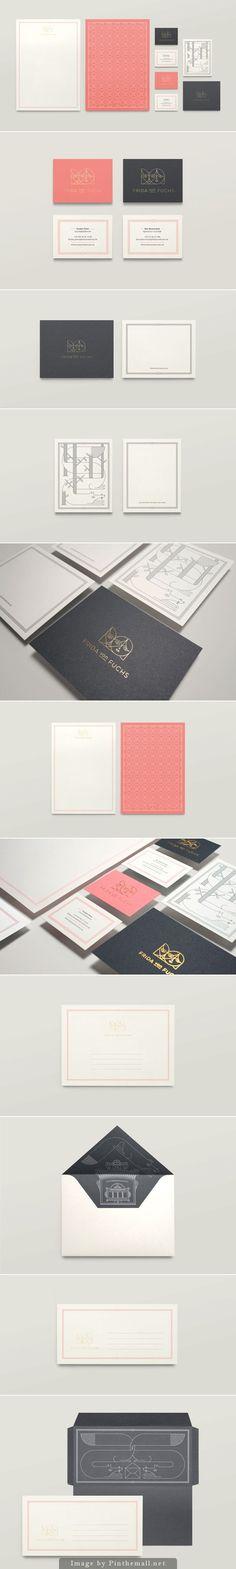 Pink and black branding